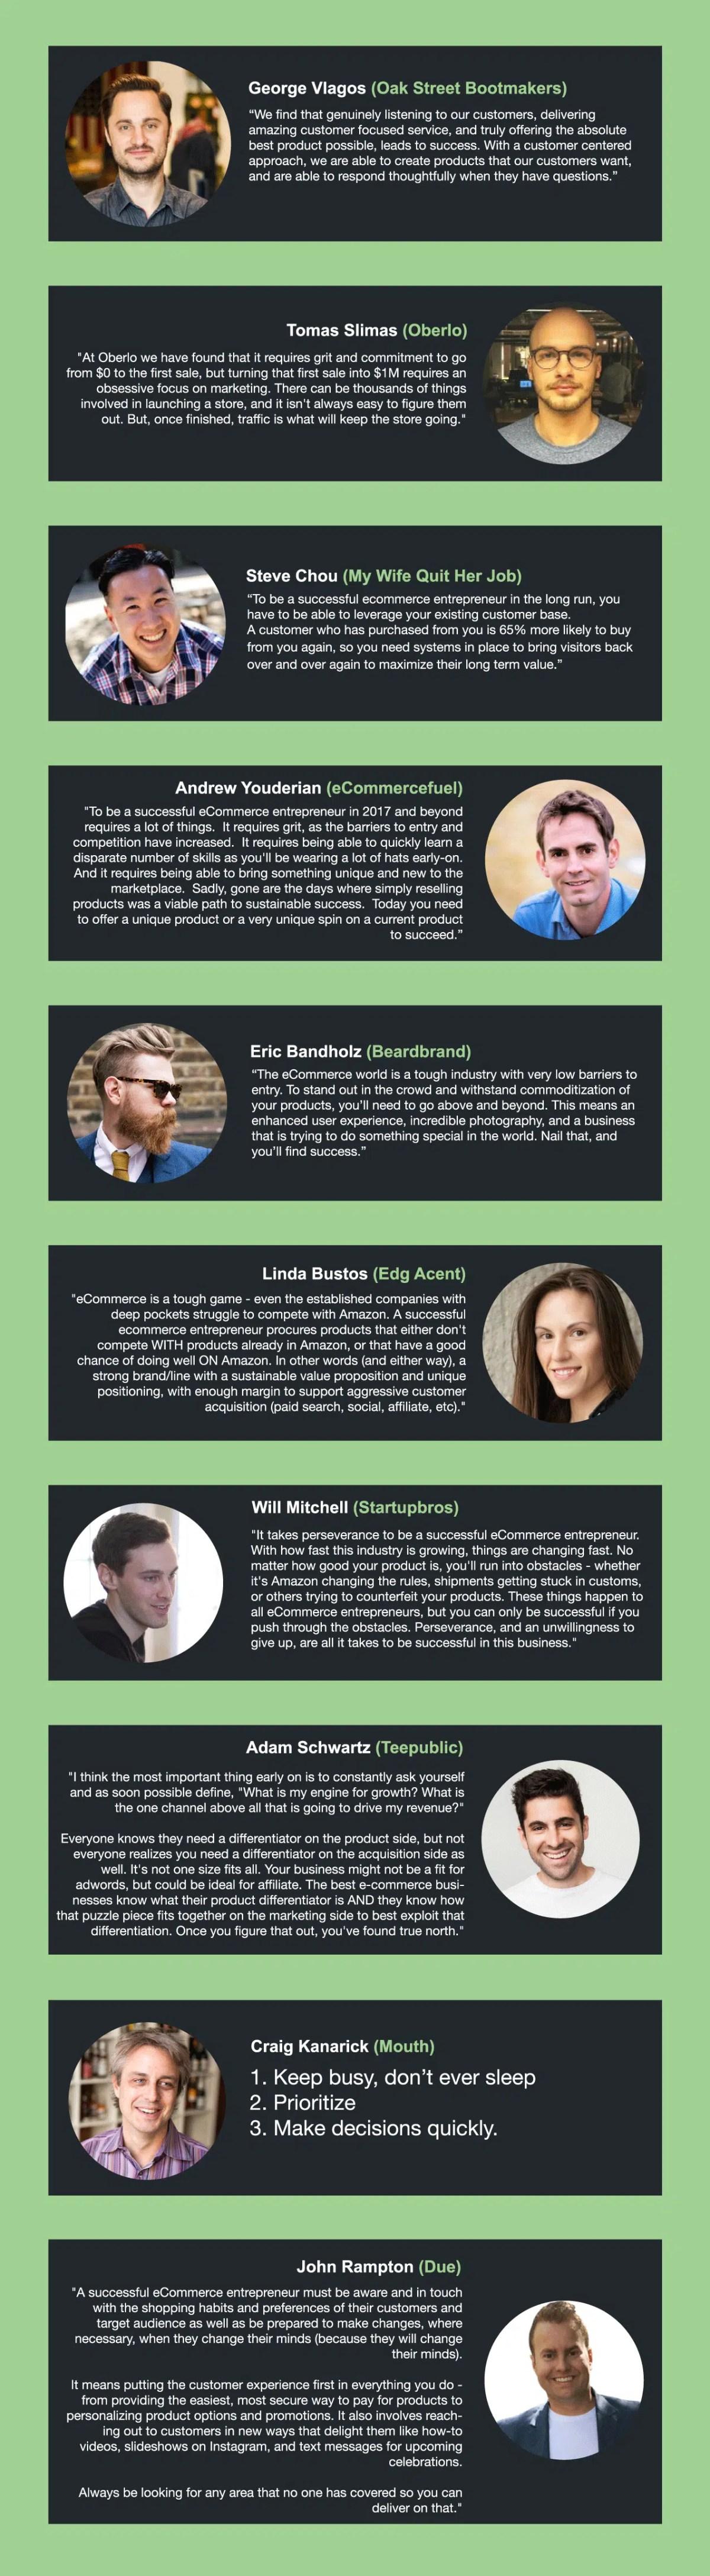 10 Successful Entrepreneurs Told us Their eCommerce Secrets